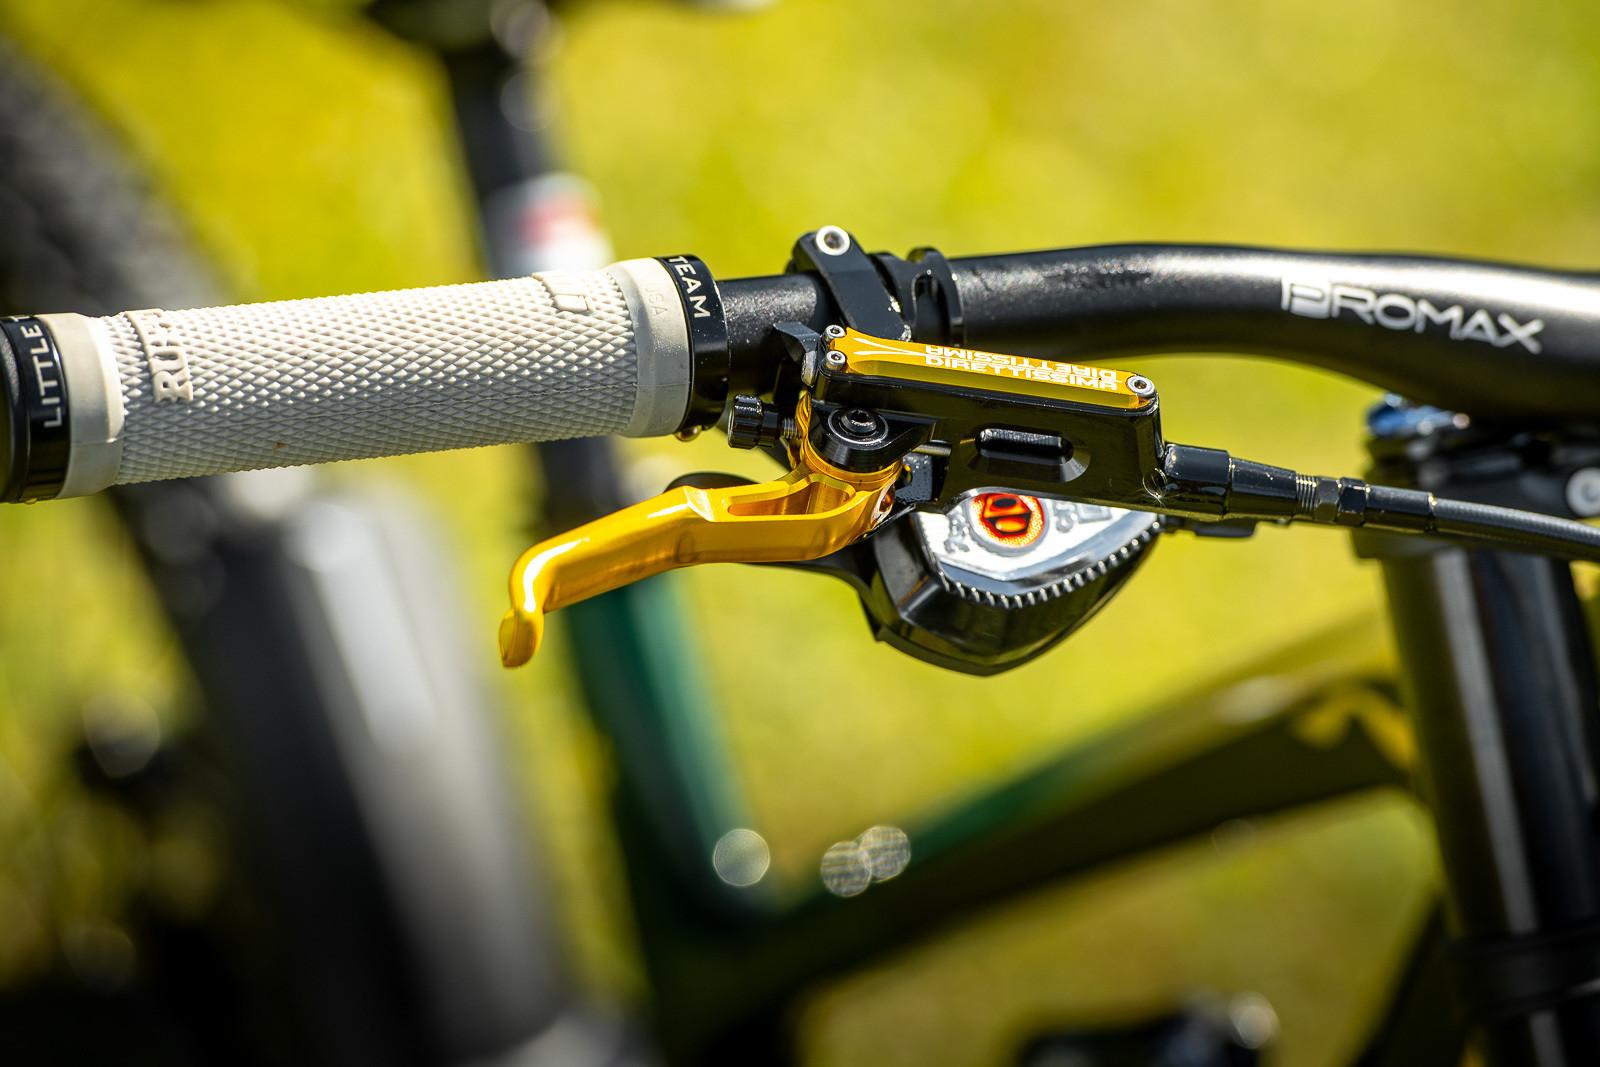 Trickstuff Direttissima Brakes - WORLD CHAMPS BIKES - Mick & Tracey Hannah's Polygons - Mountain Biking Pictures - Vital MTB